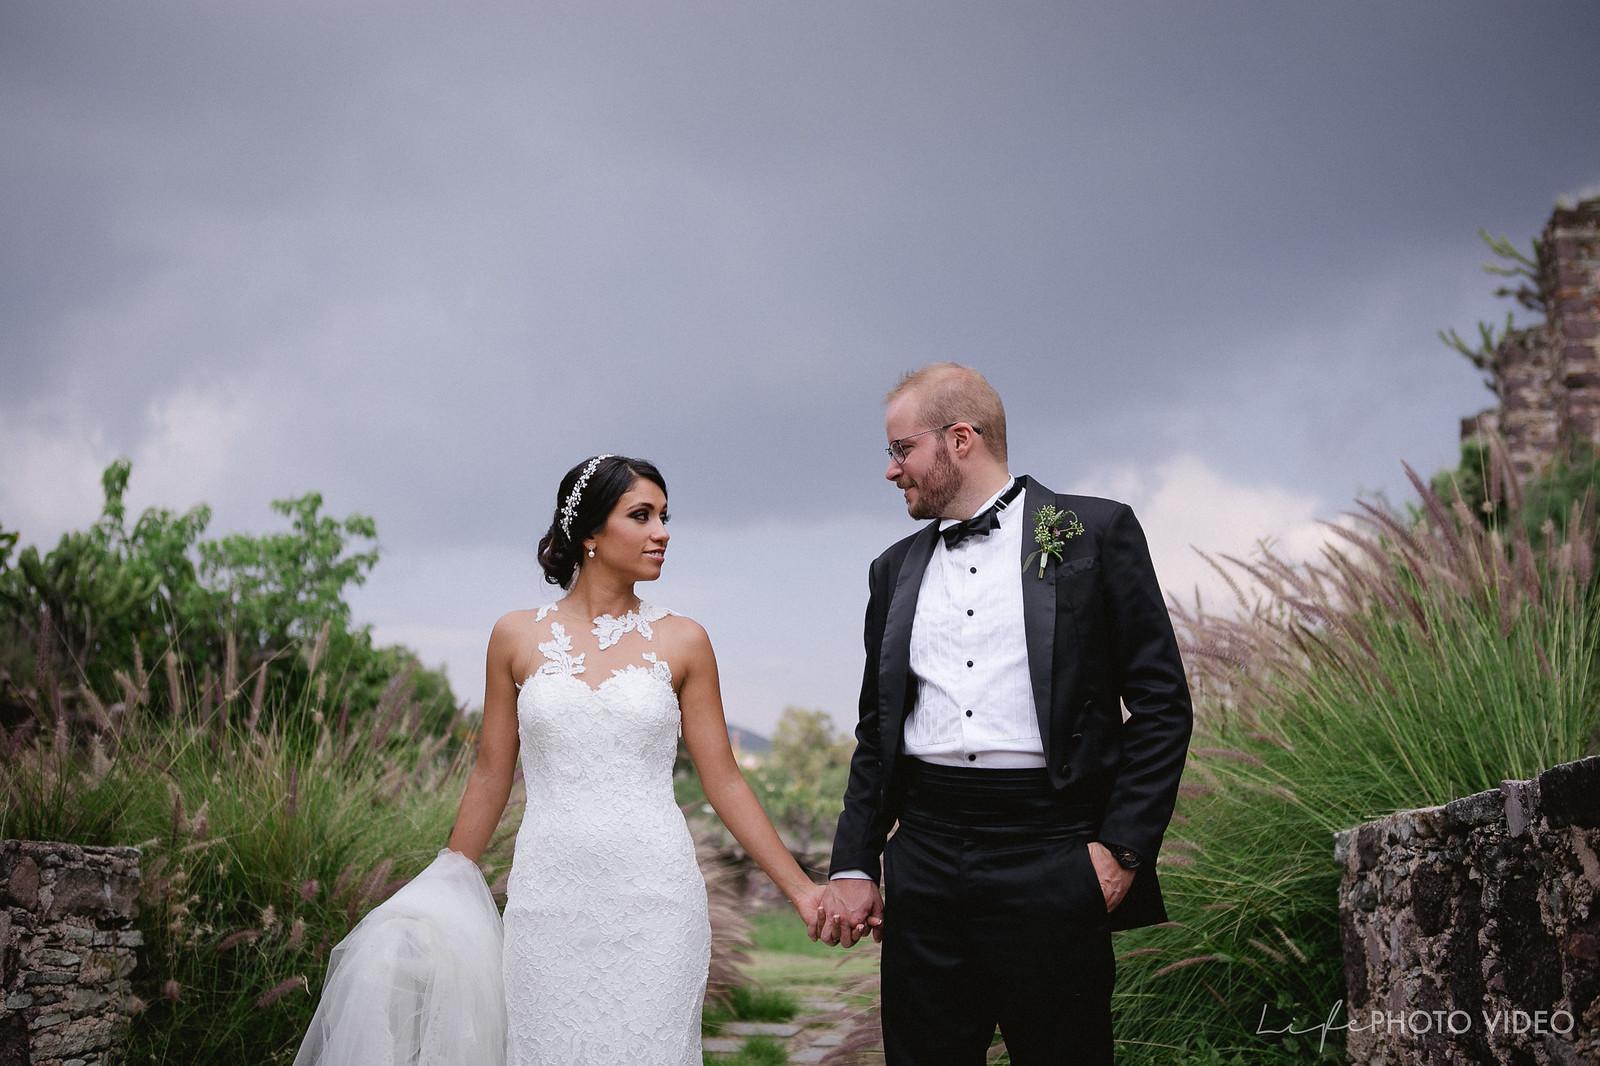 LifePhotoVideo_Boda_Guanajuato_Wedding_0020